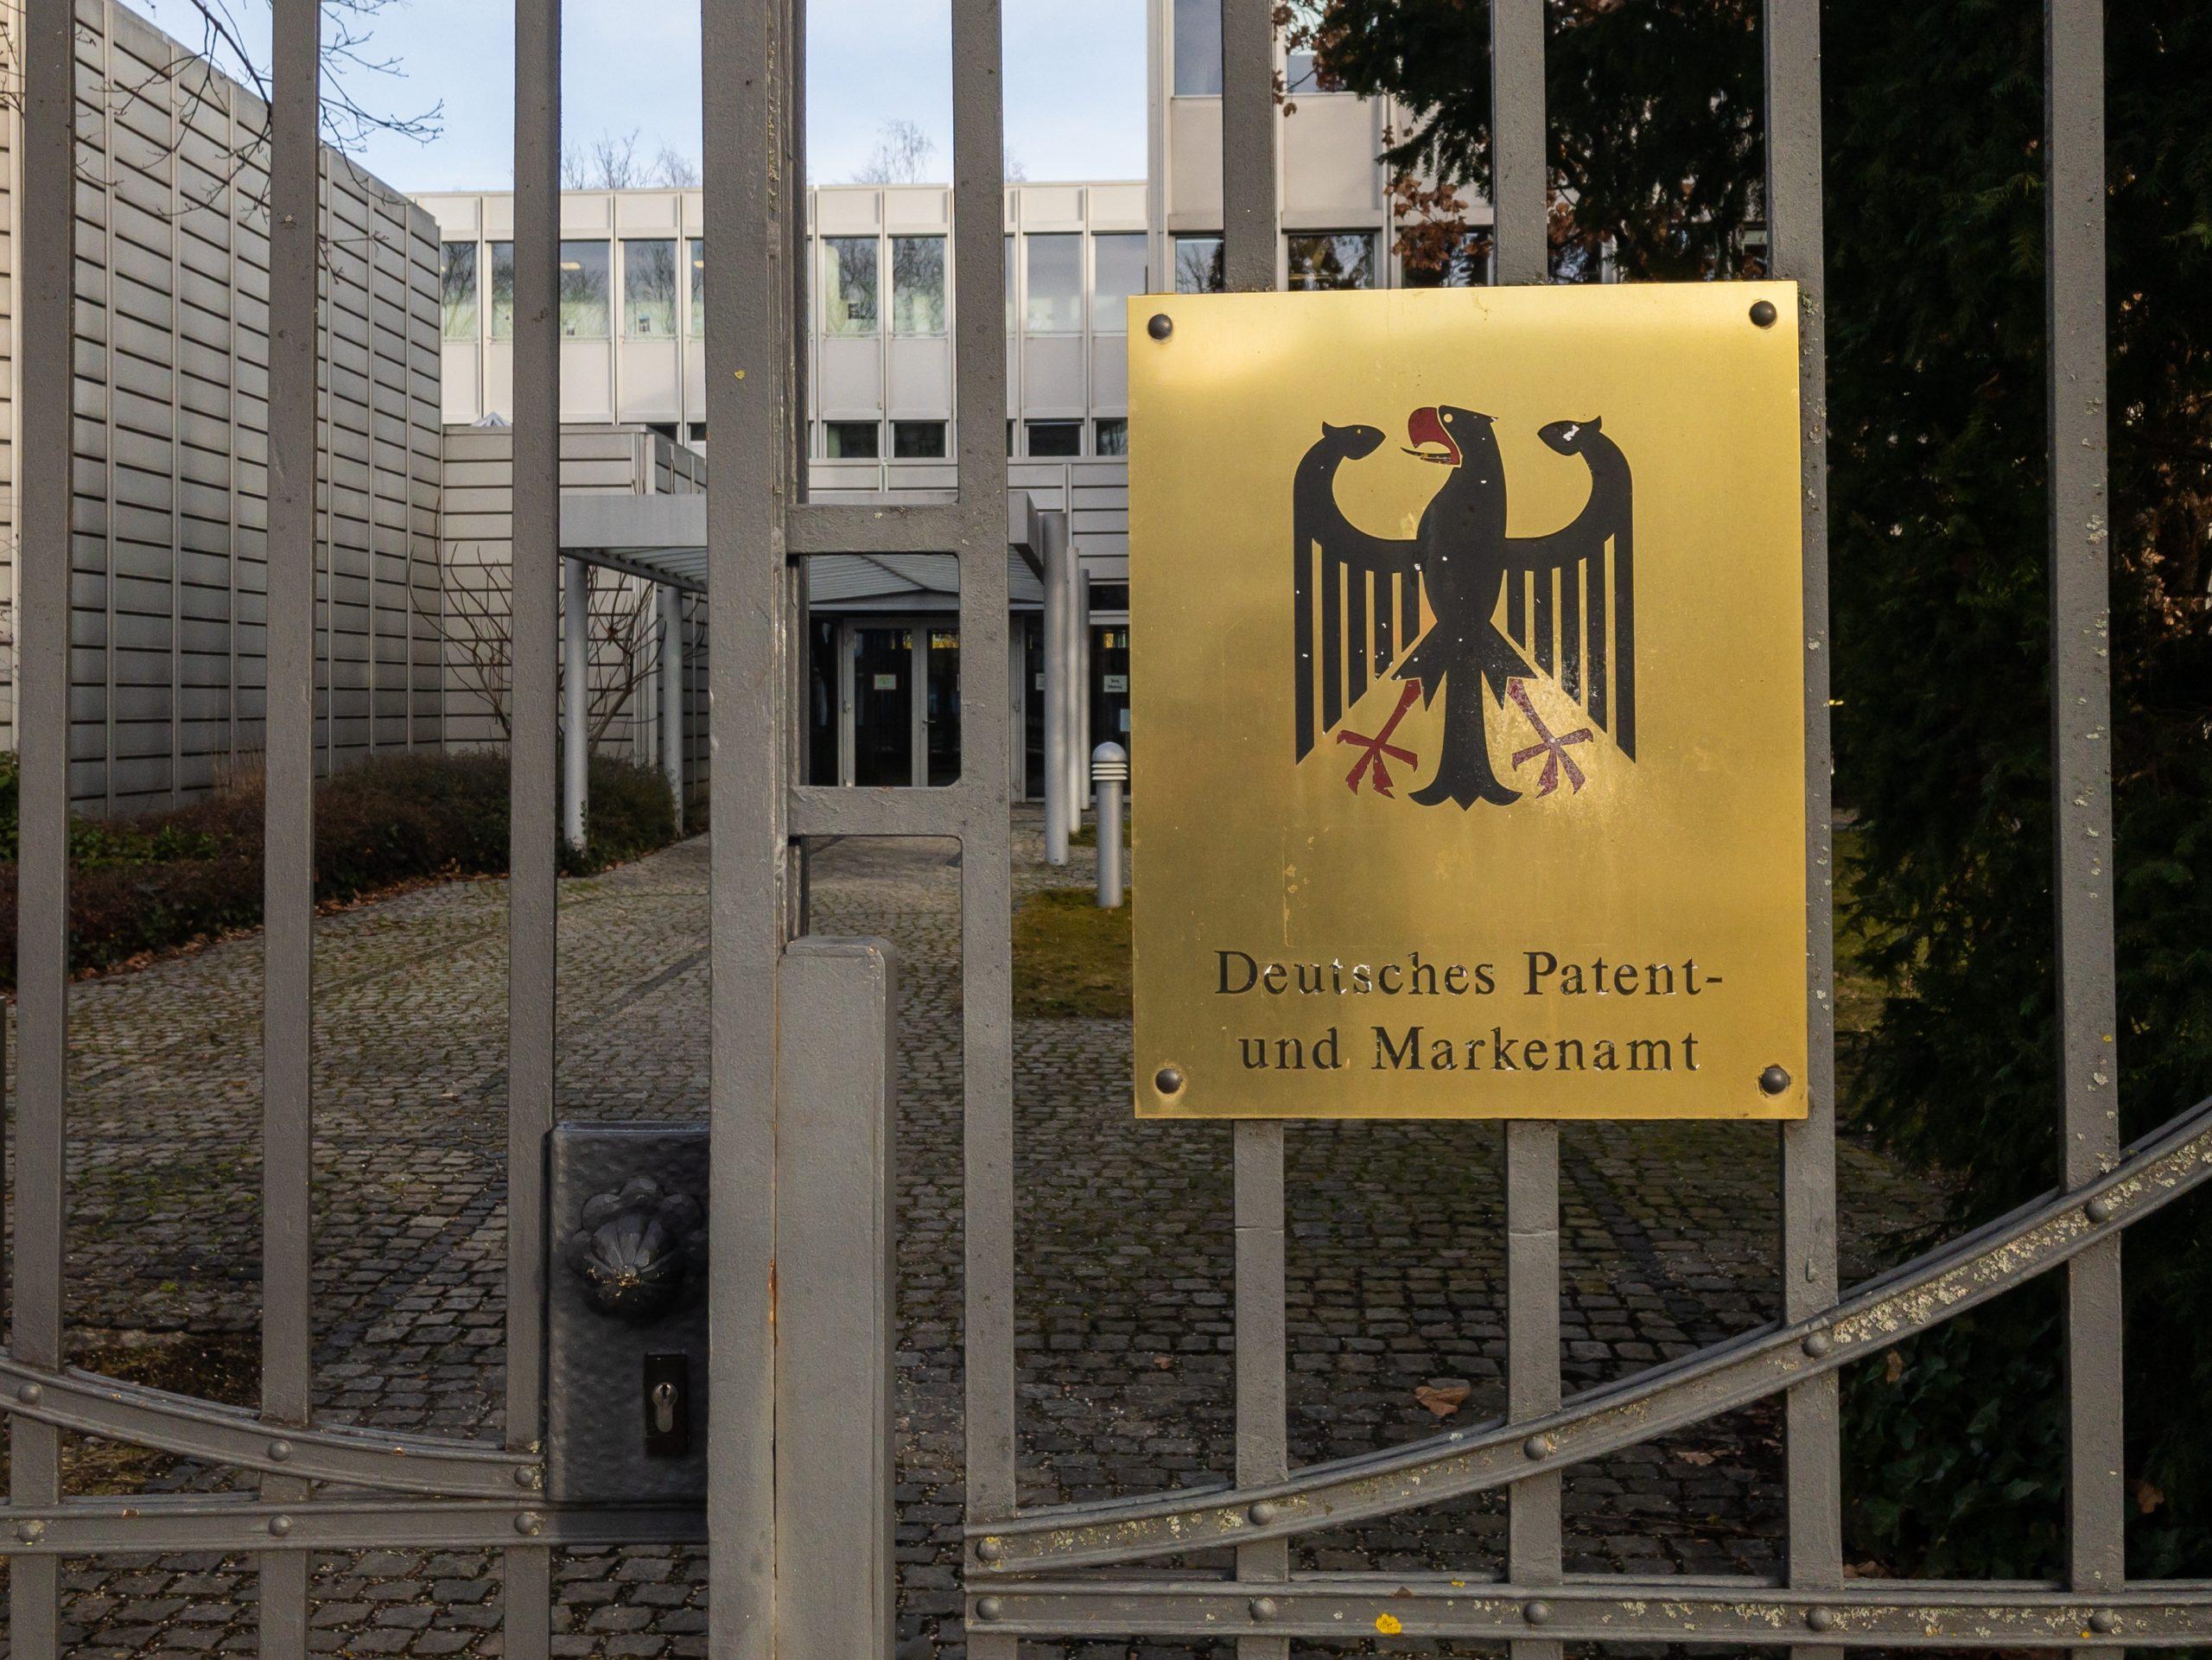 https://depositphotos.com/342985452/stock-photo-munich-germany-jan-2020-entrance.html